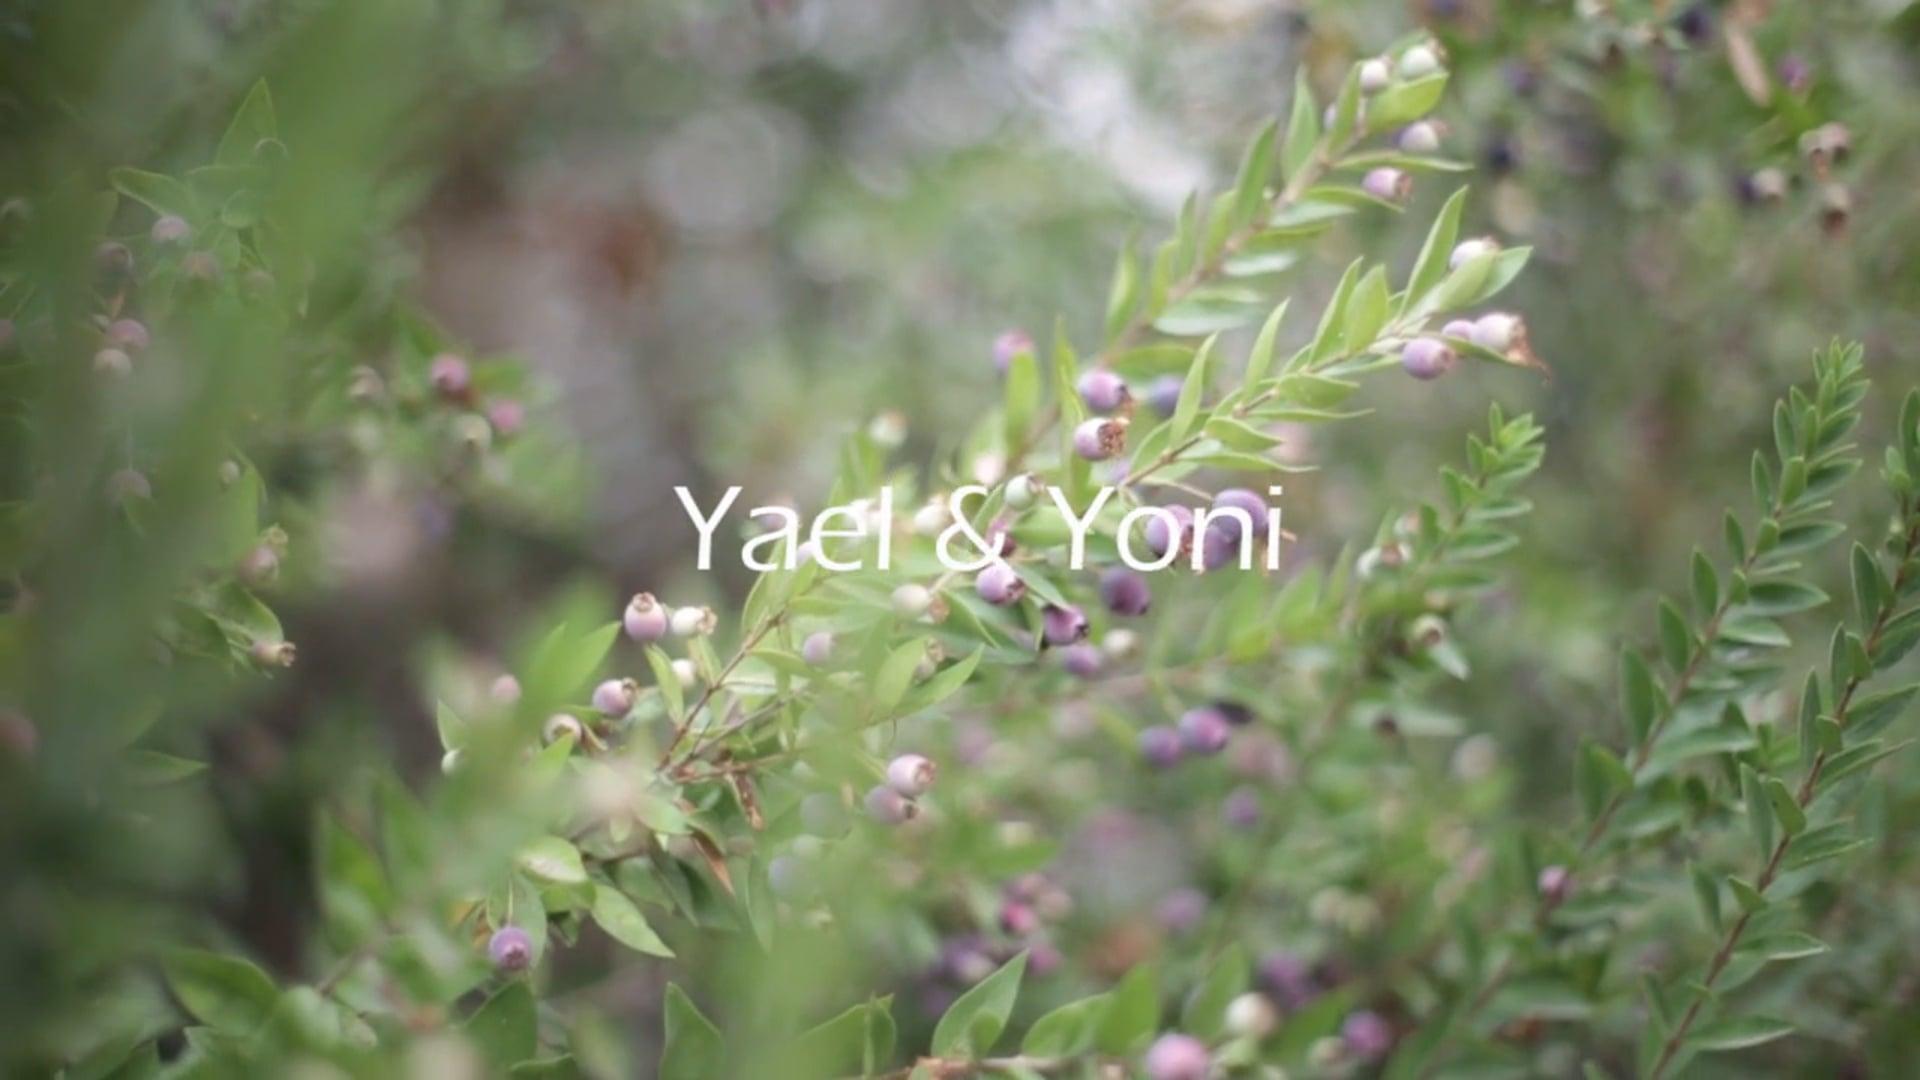 Yael & Yoni